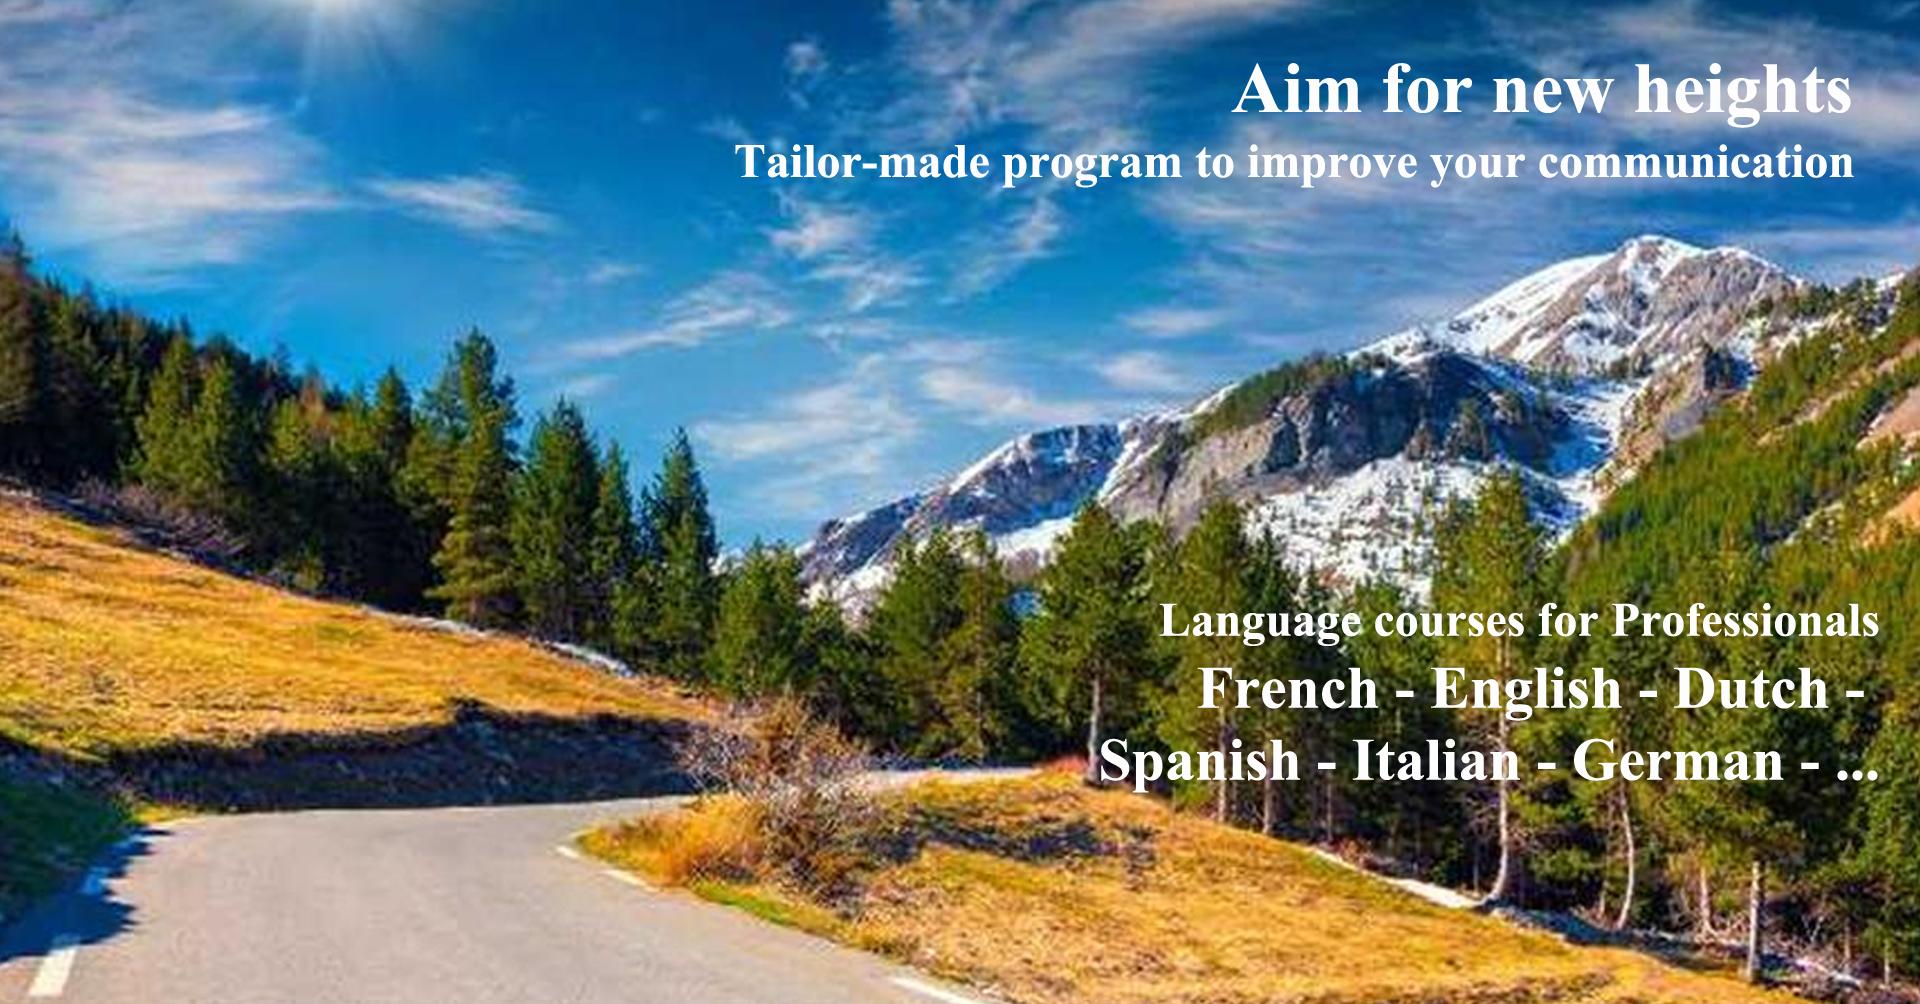 tailor-made language program